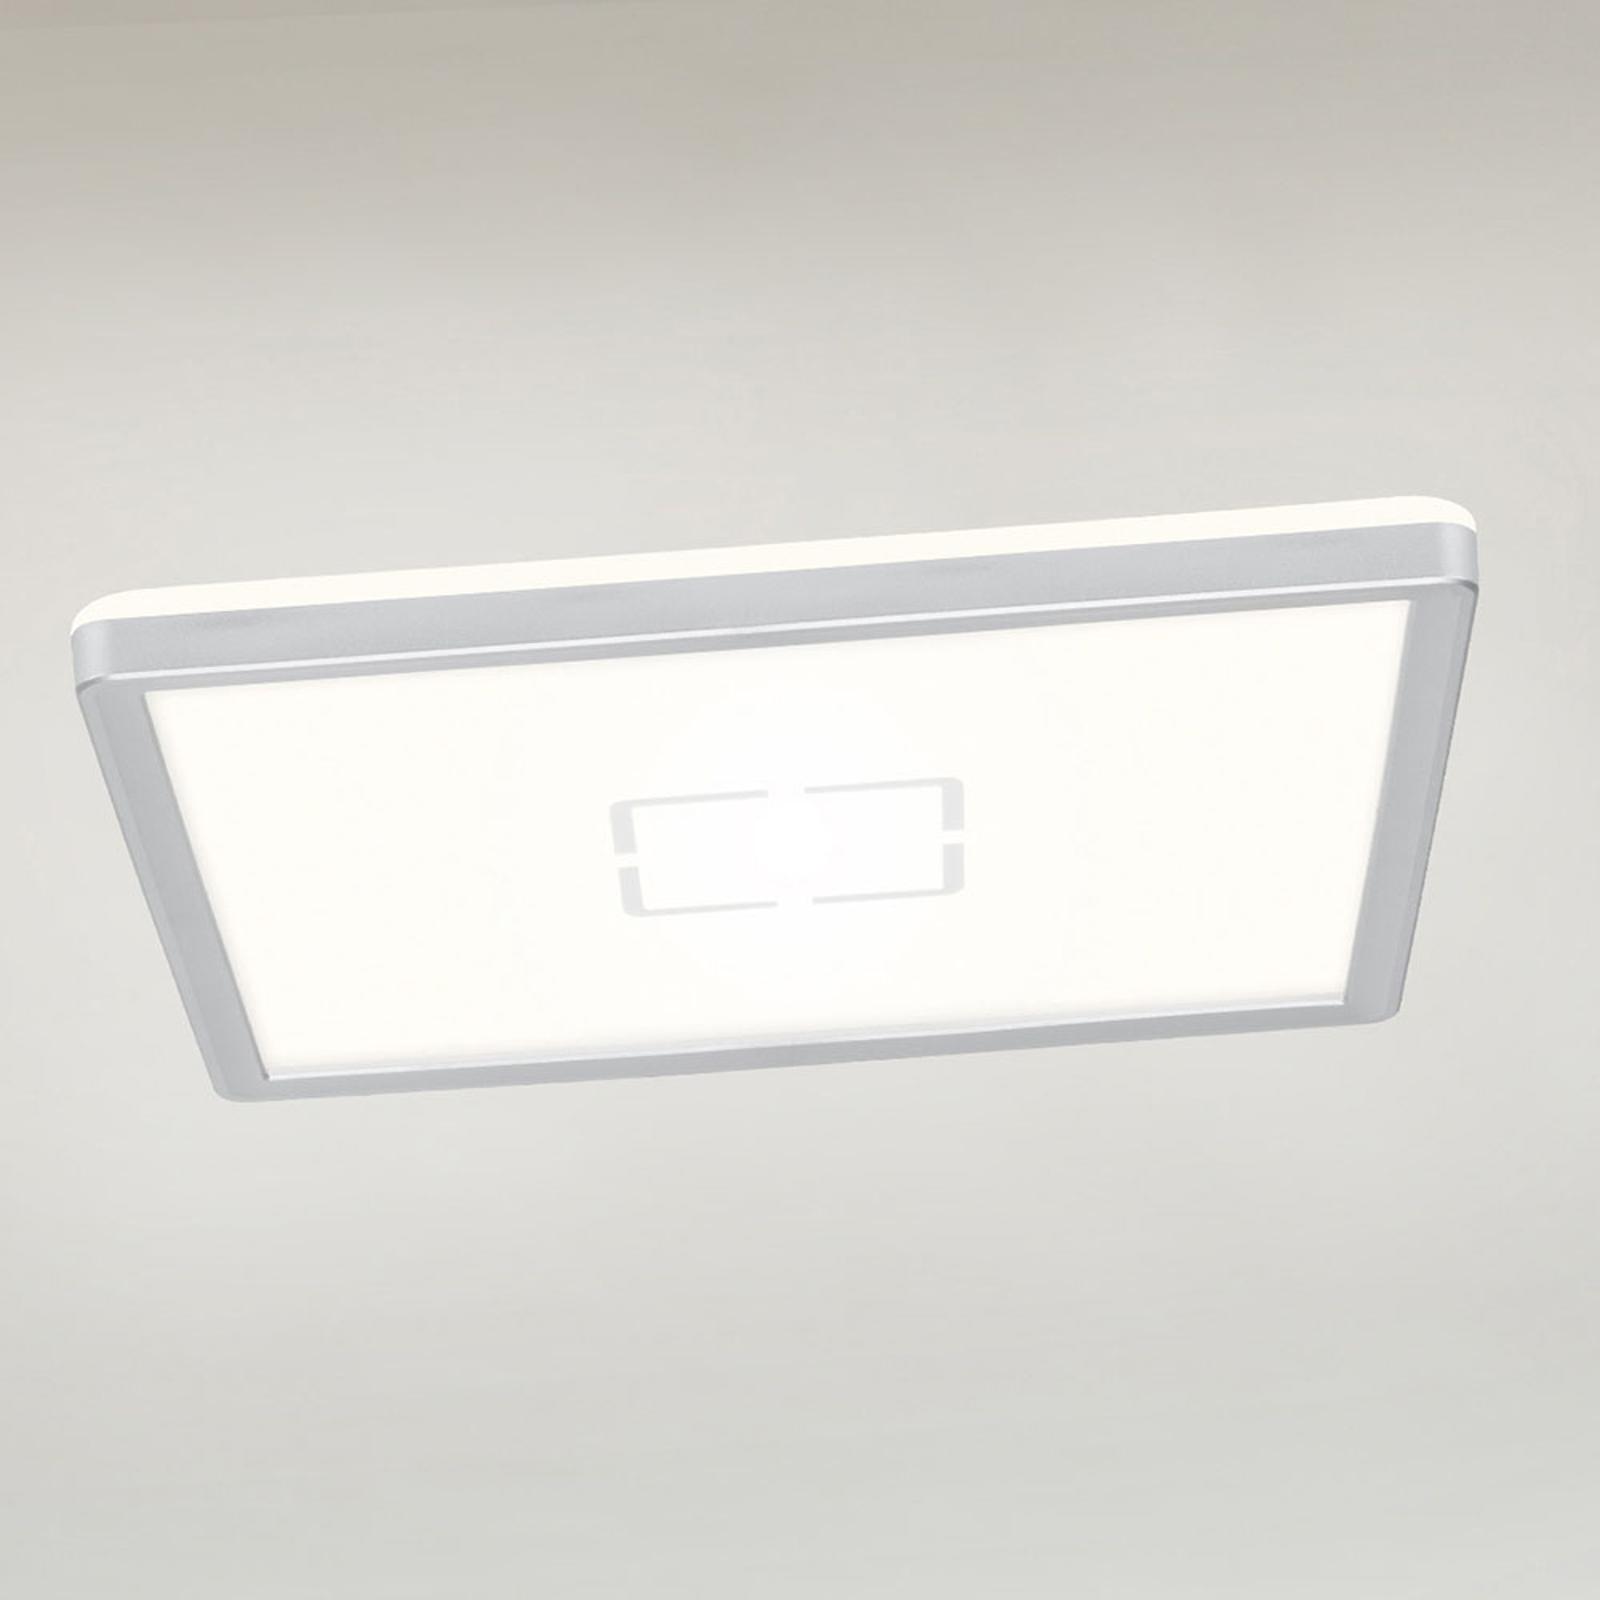 Lampa sufitowa LED Free, 29 x 29 cm, srebrna